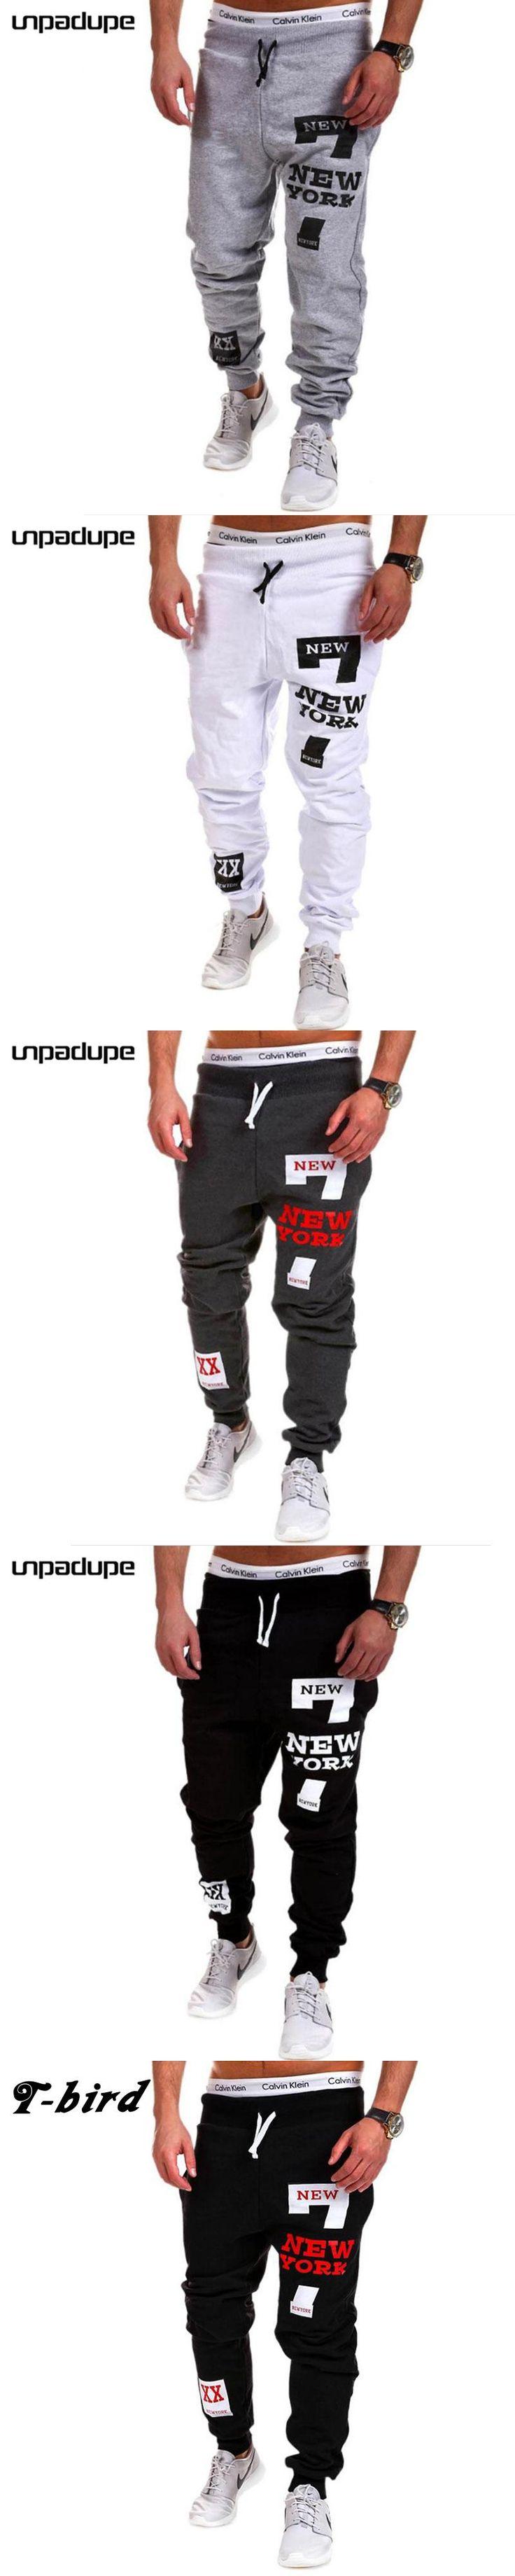 Mens Joggers 2017 Brand New Men Casual Pants Male Fashion Cool Sweatpants Outwear Trousers Hip Hop  Mens Joggers Pants Black 3XL